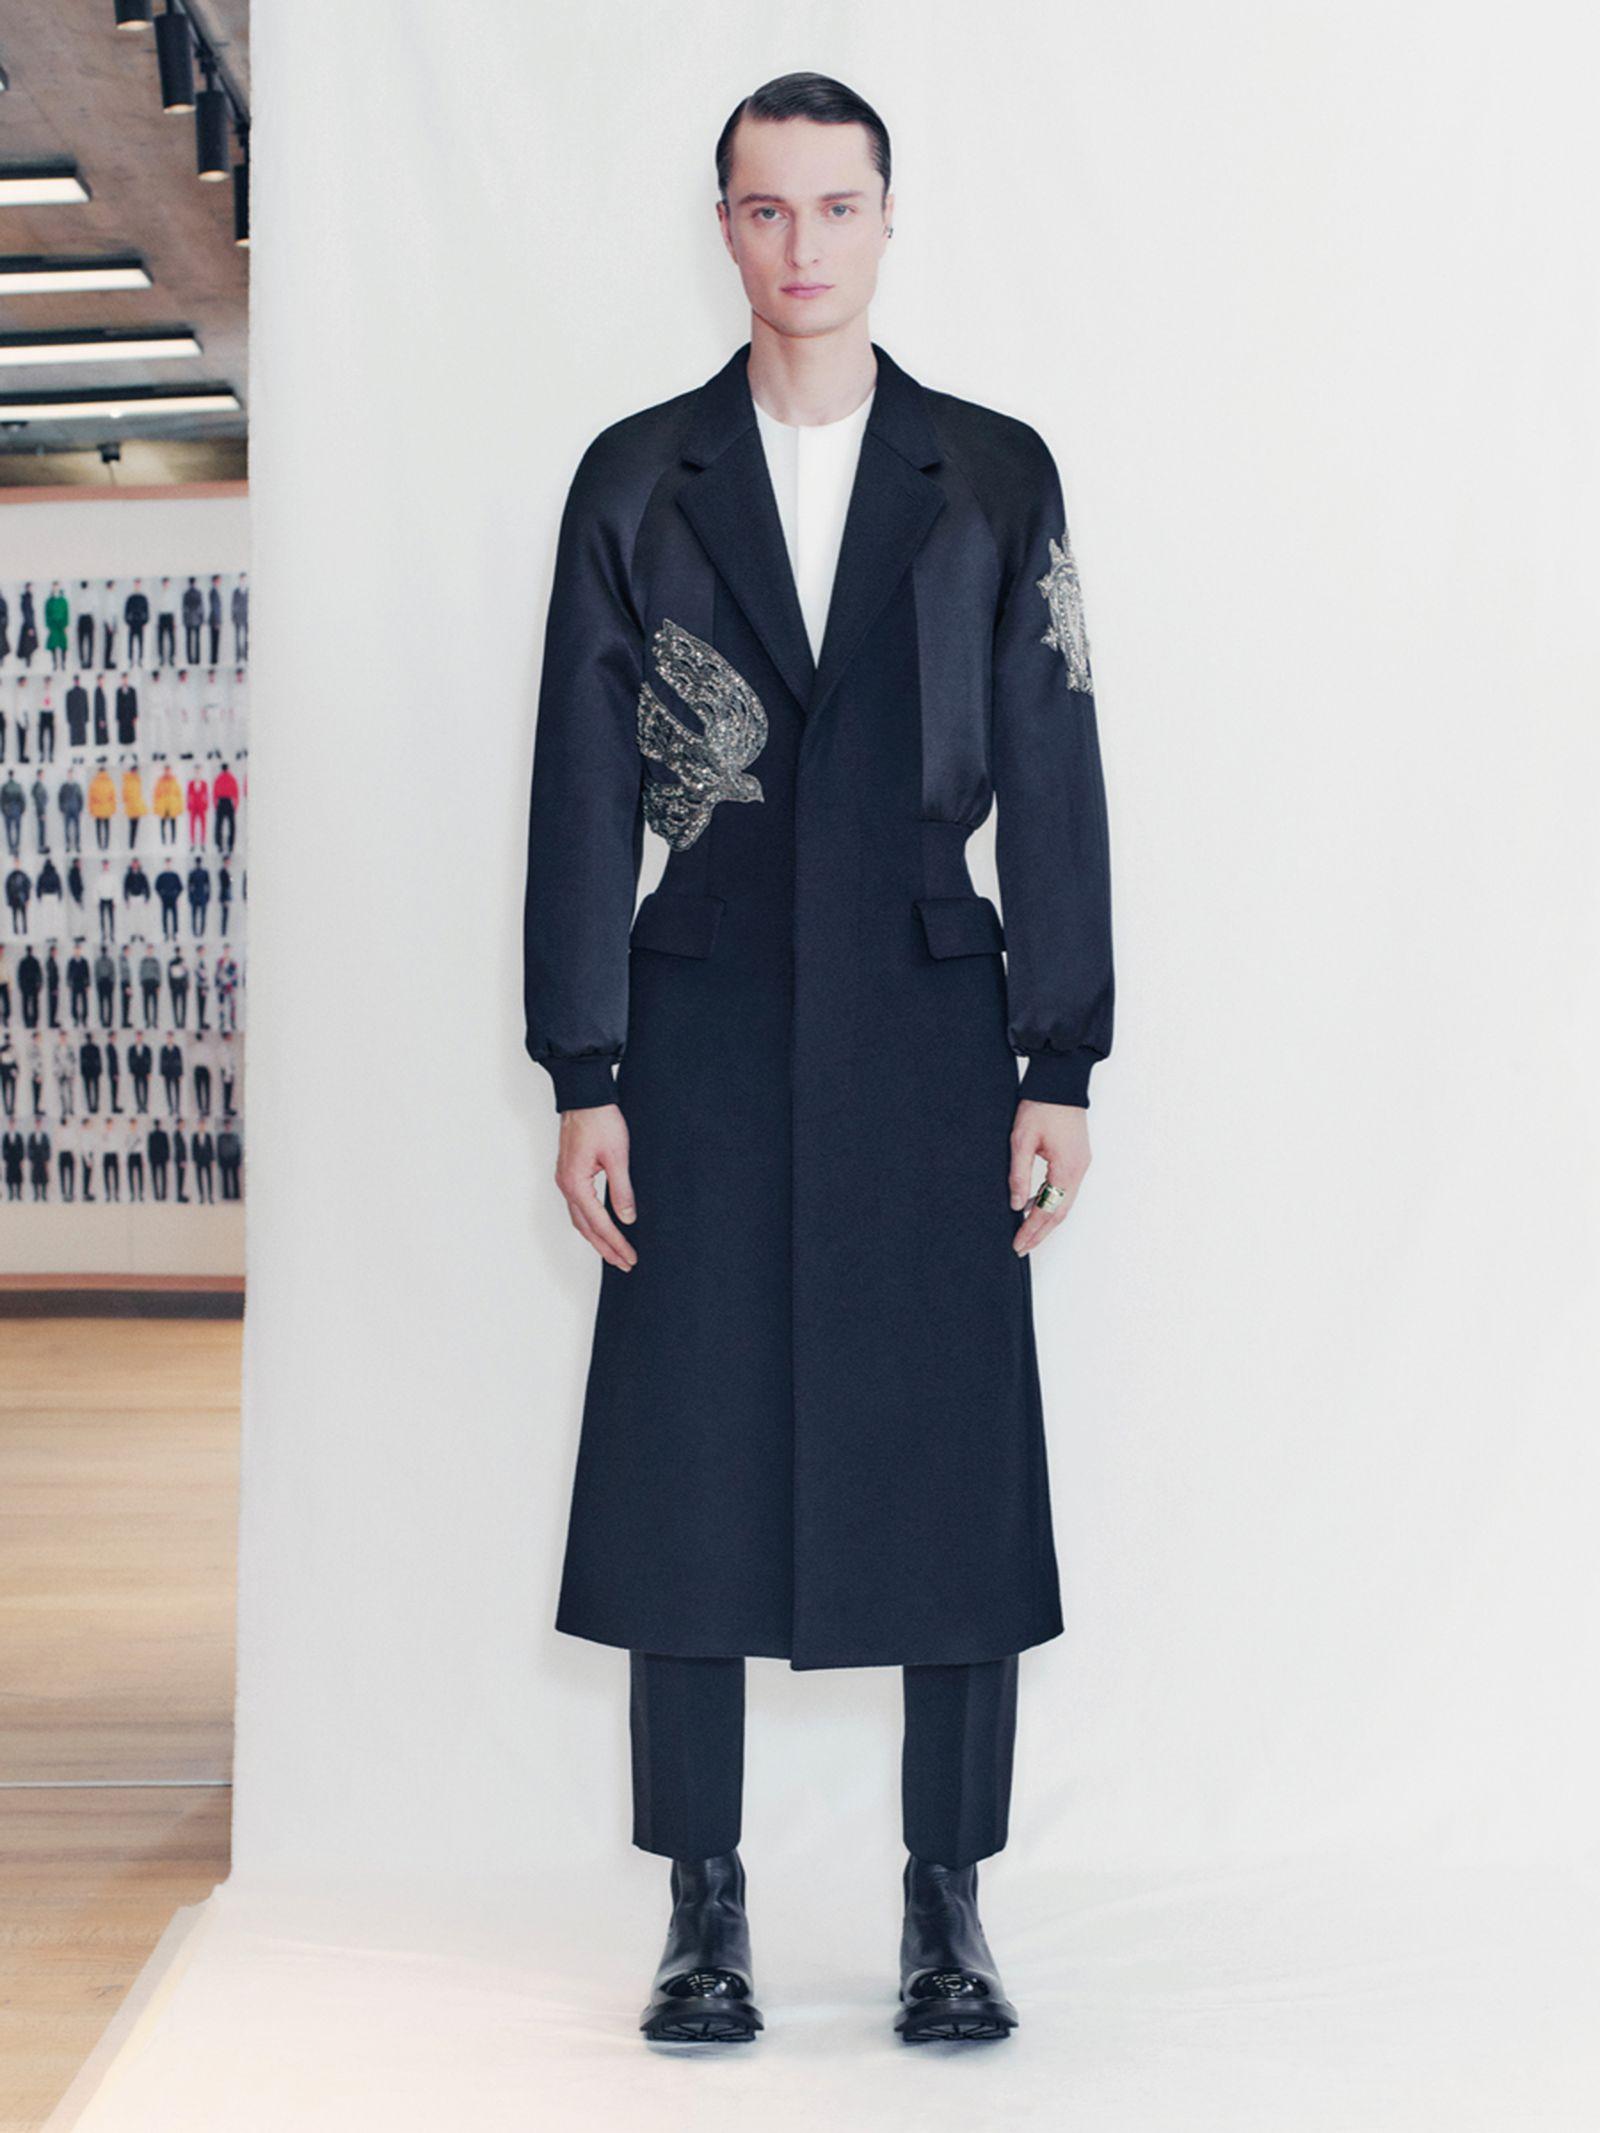 alexander-mcqueen-fall-winter-2021-collection- (26)